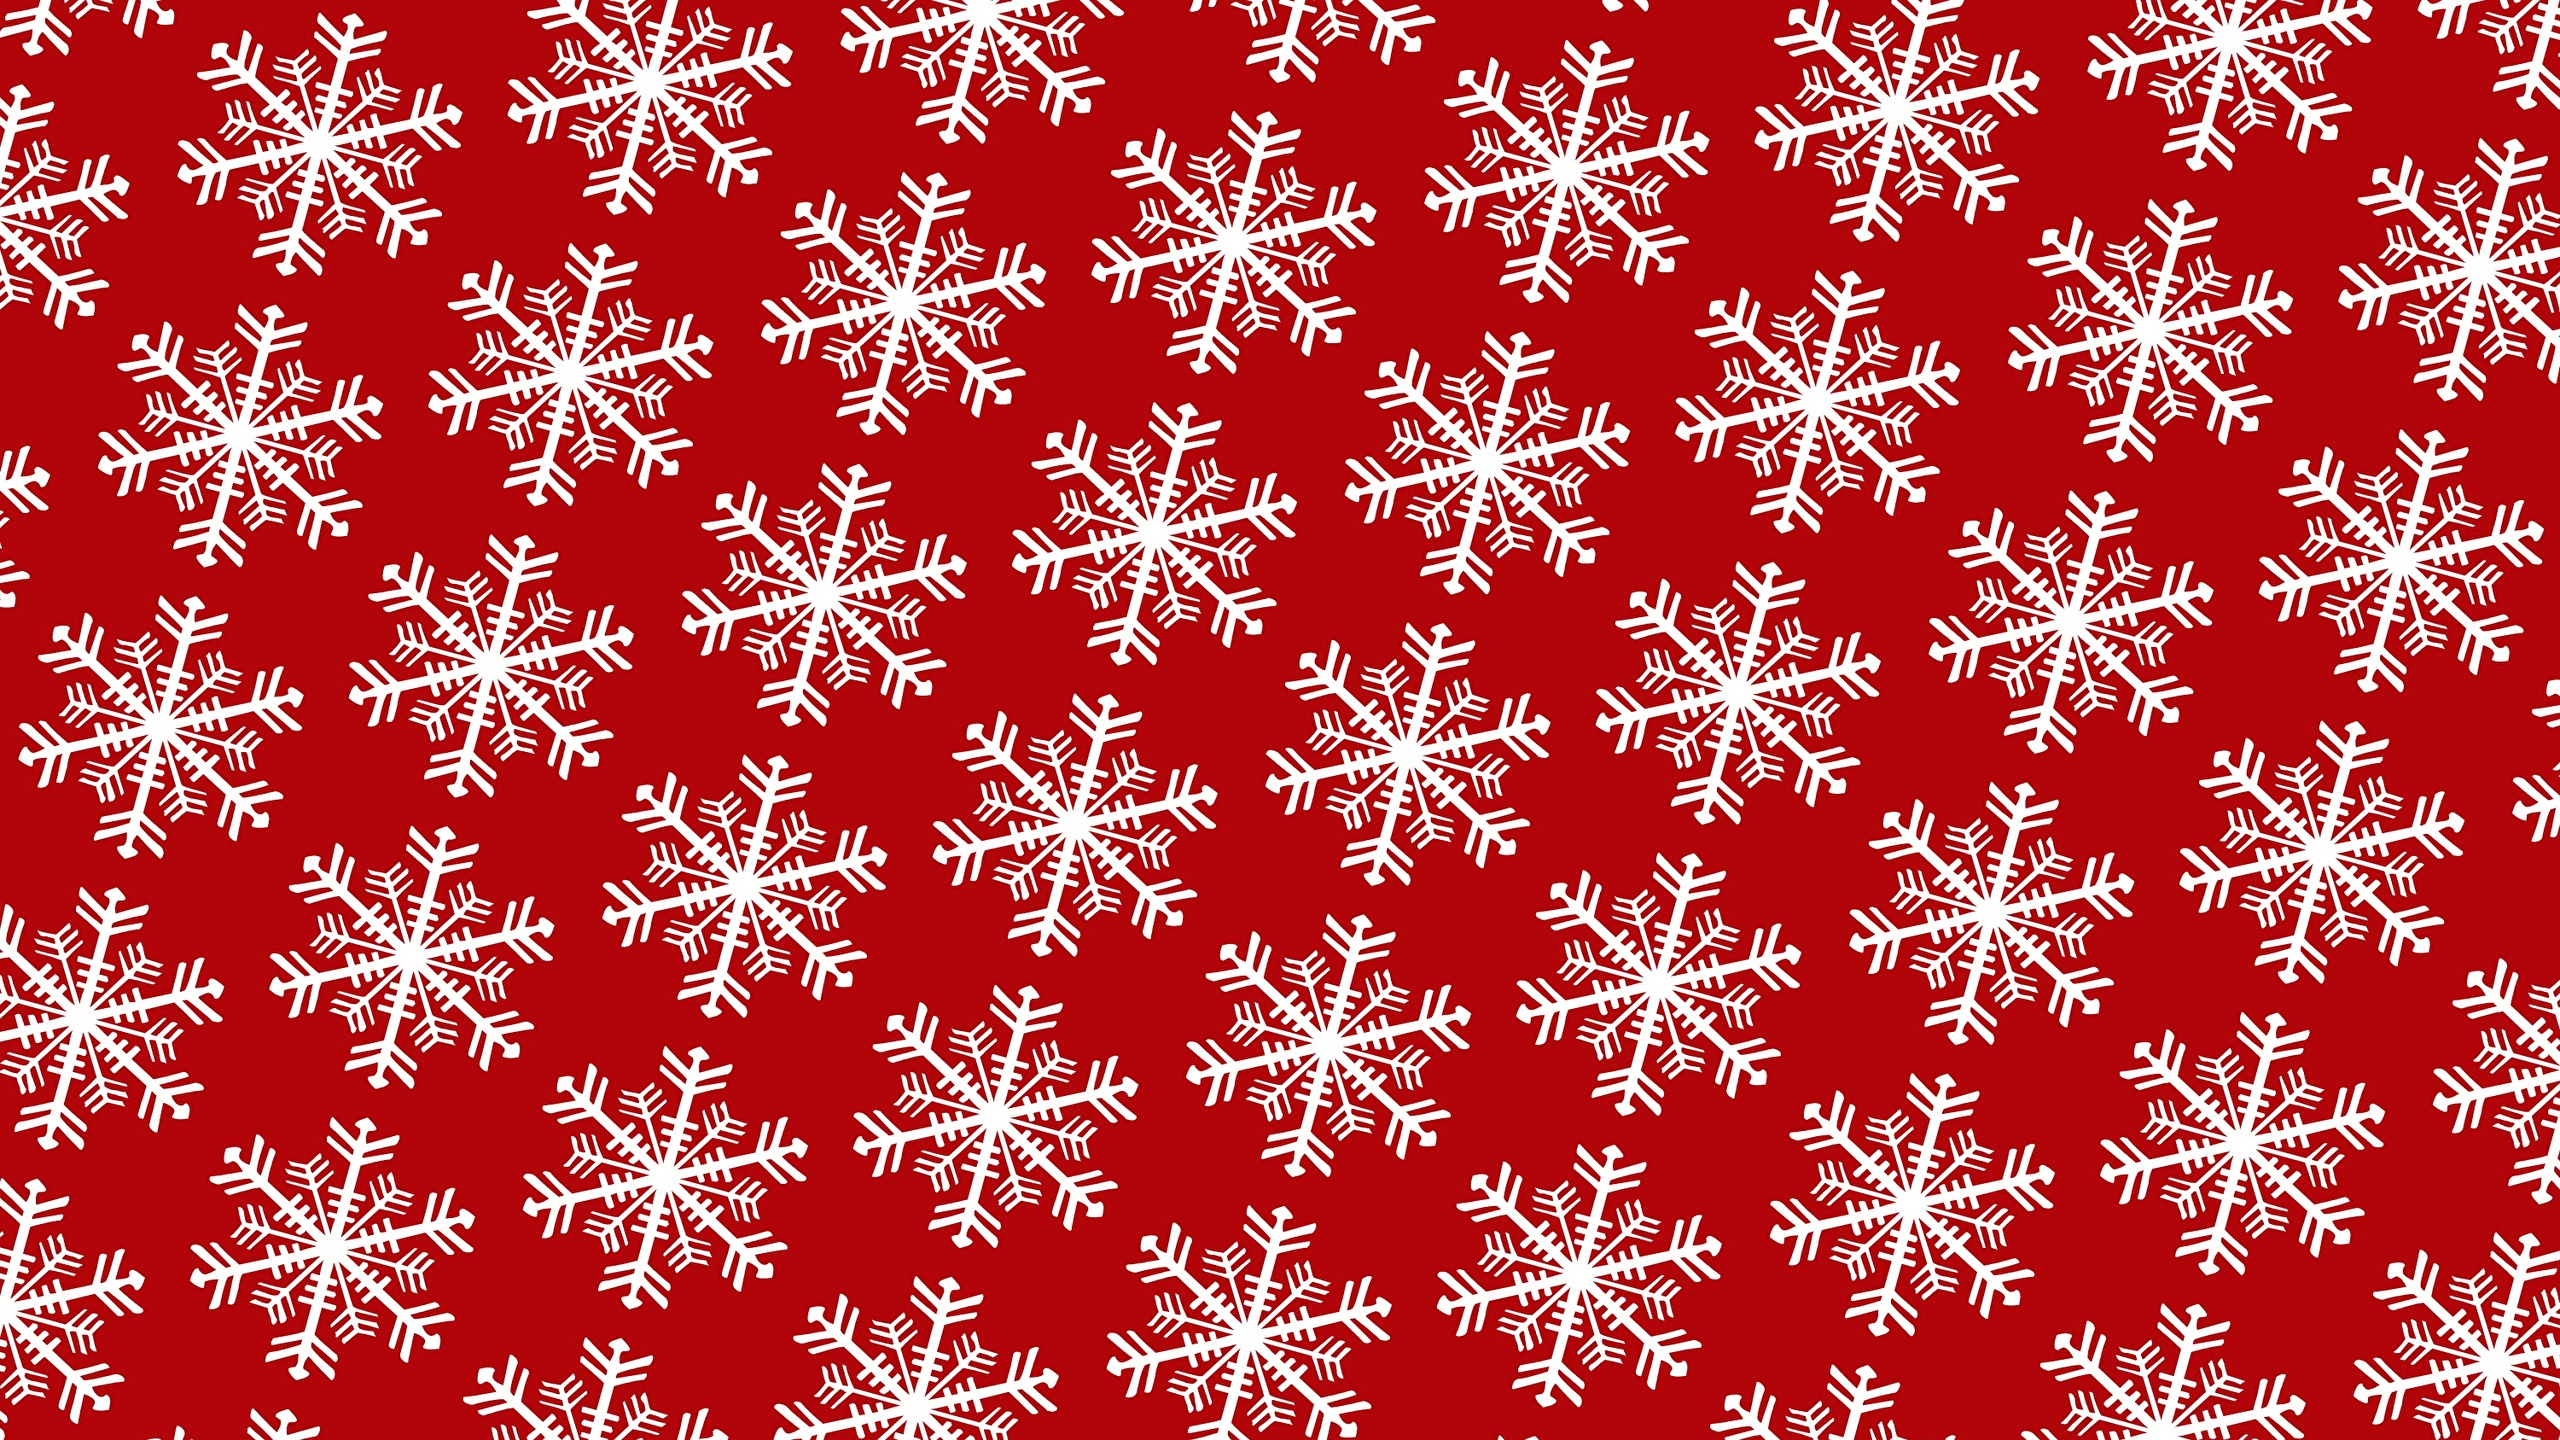 Christmas Texture.Images Texture Christmas Snowflakes 2560x1440